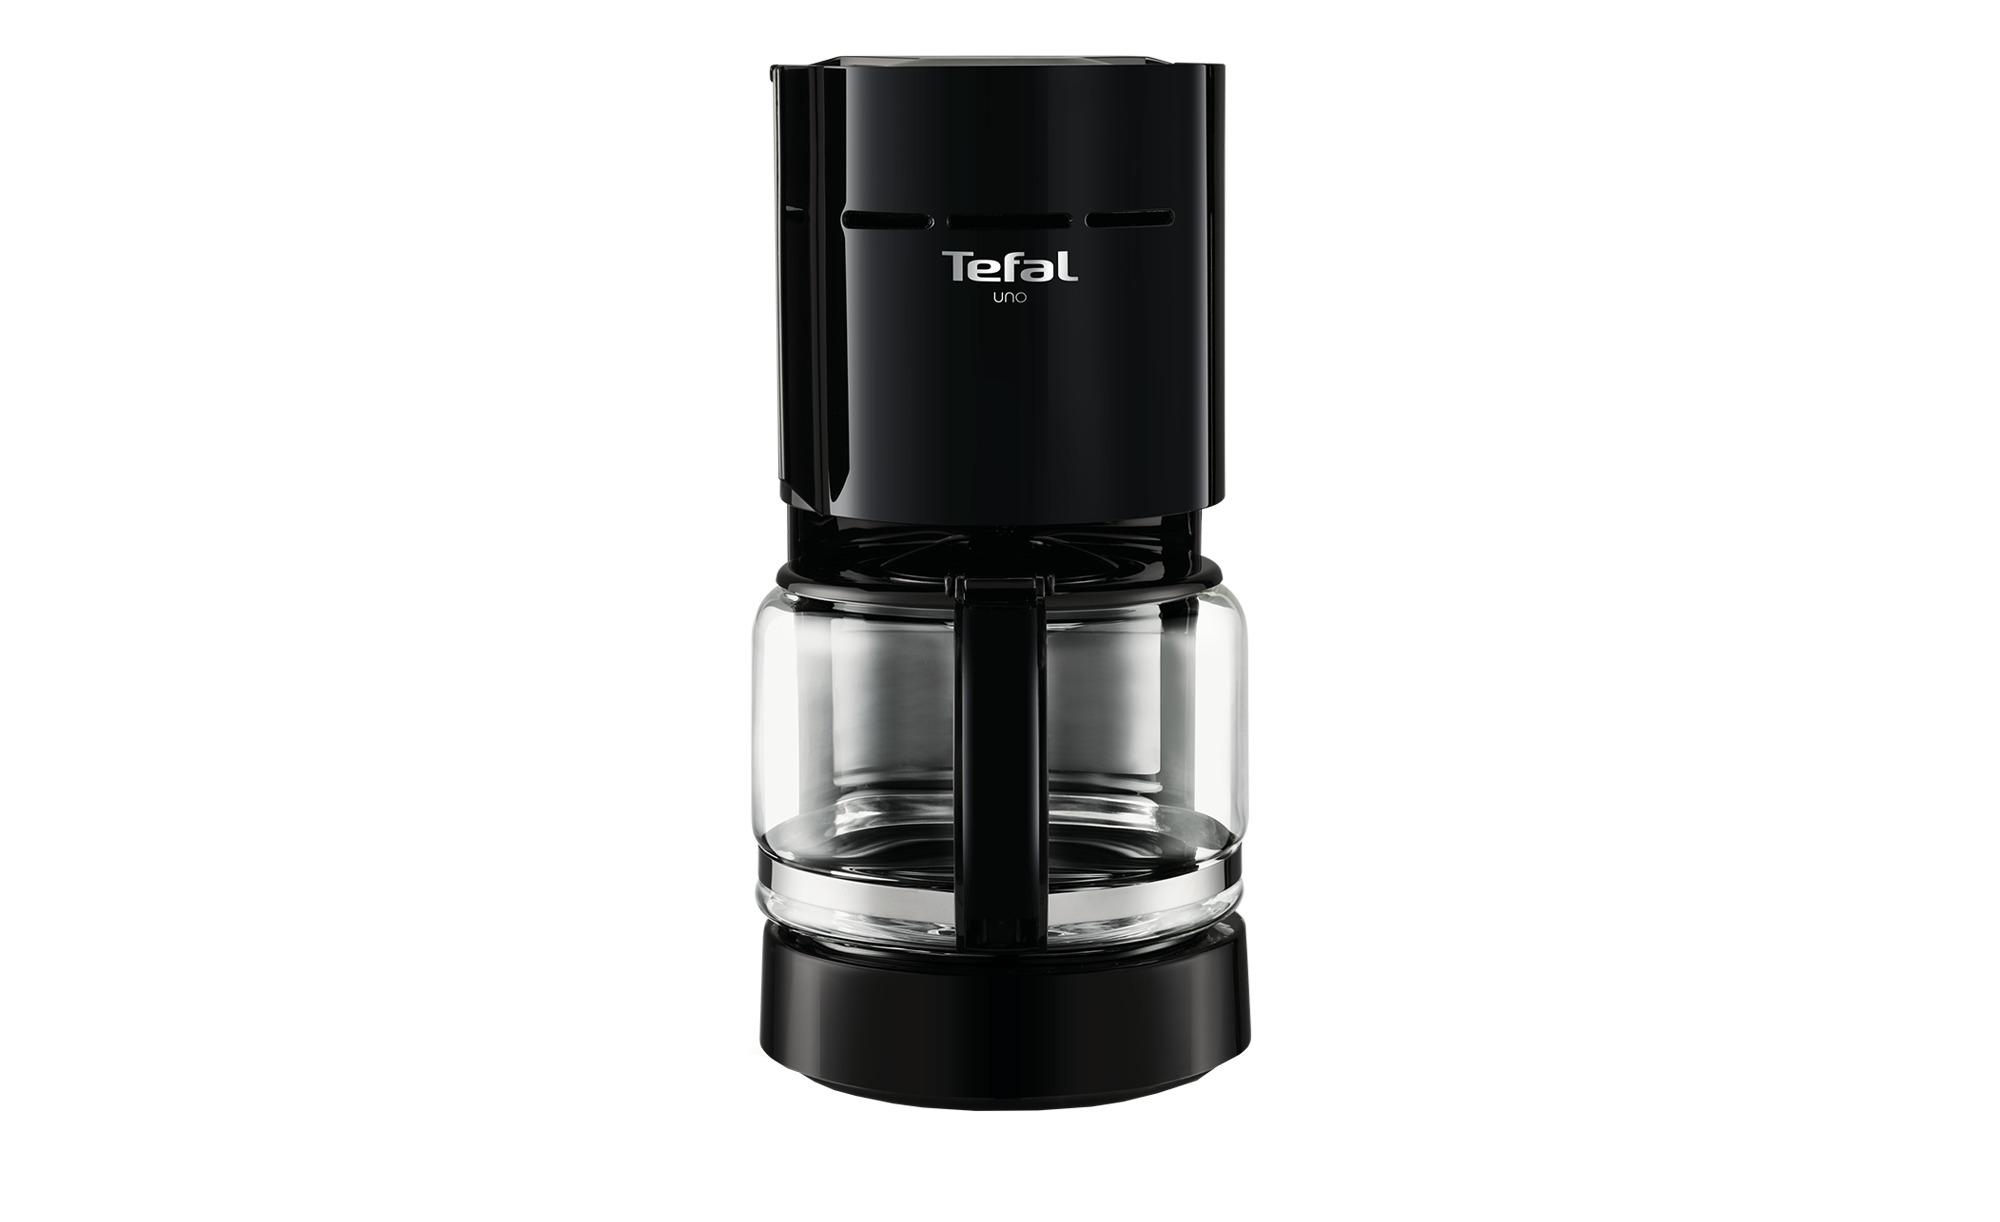 Tefal Kaffeeautomat  CM 1218 - schwarz - 28,7 cm - 33,2 cm - 20,2 cm - Elektrokleingeräte > Kaffee & Espressomaschinen - Möbel Kraft